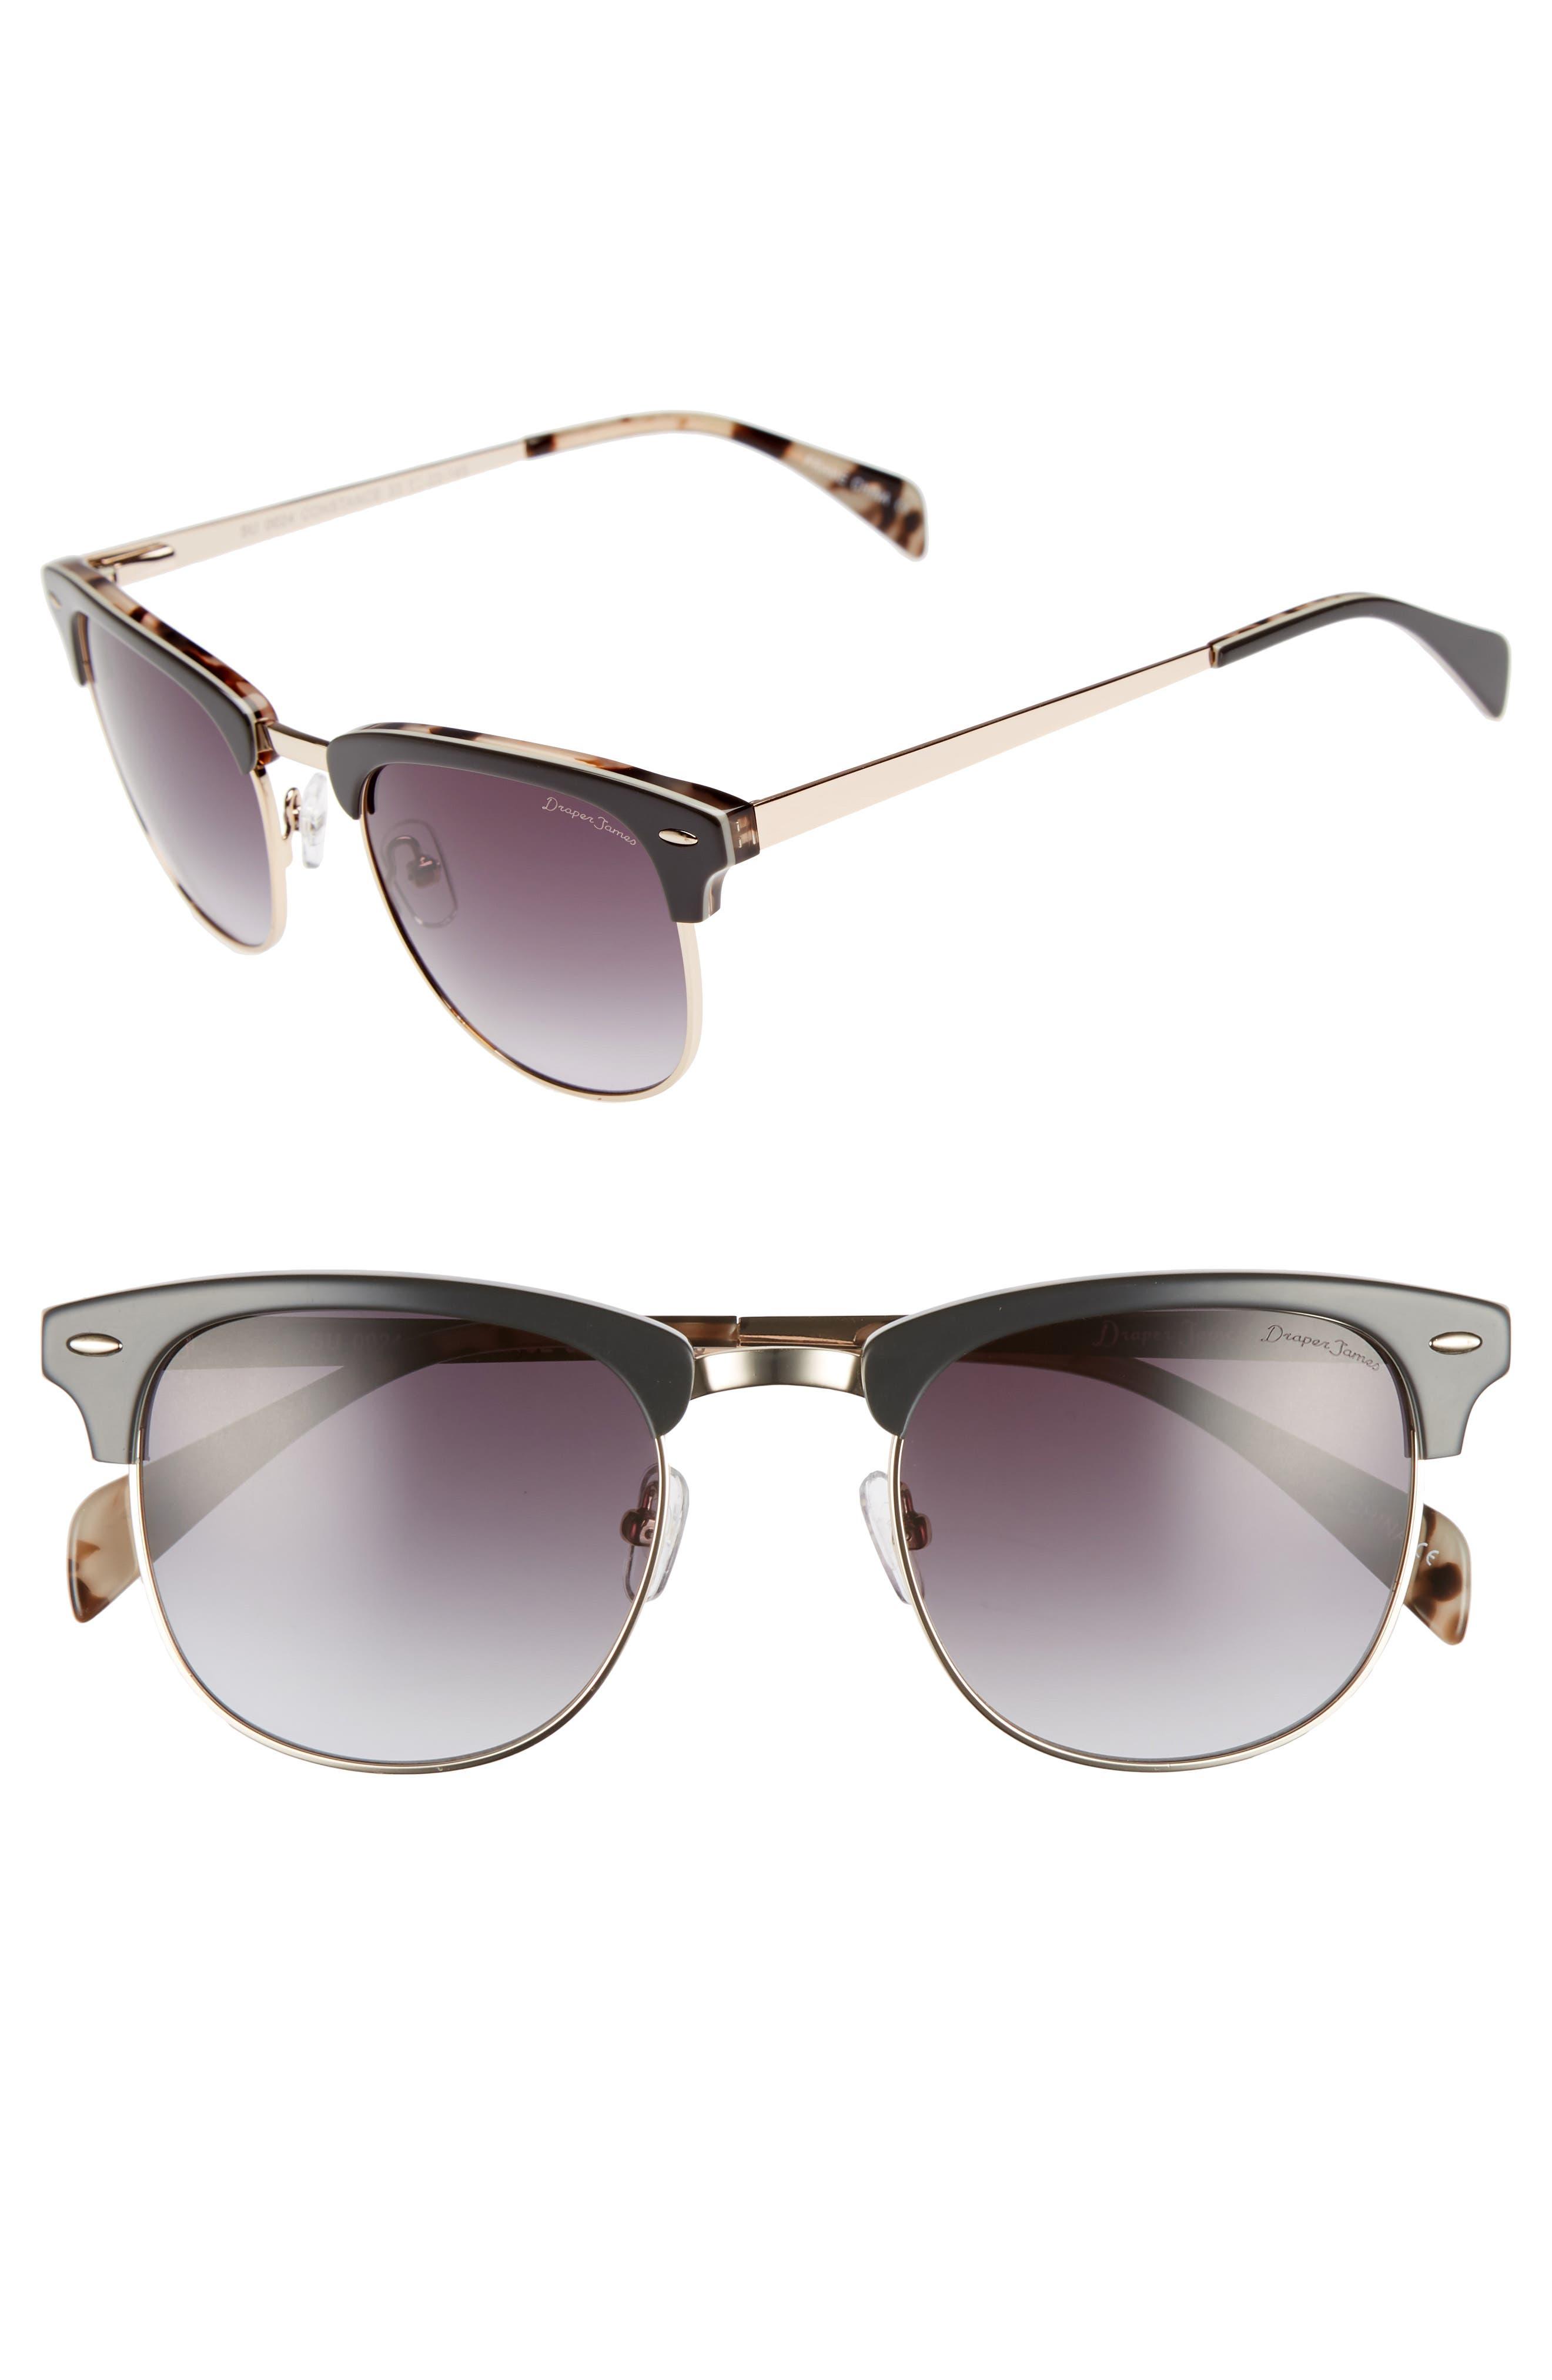 55mm Sunglasses,                             Main thumbnail 1, color,                             GREY